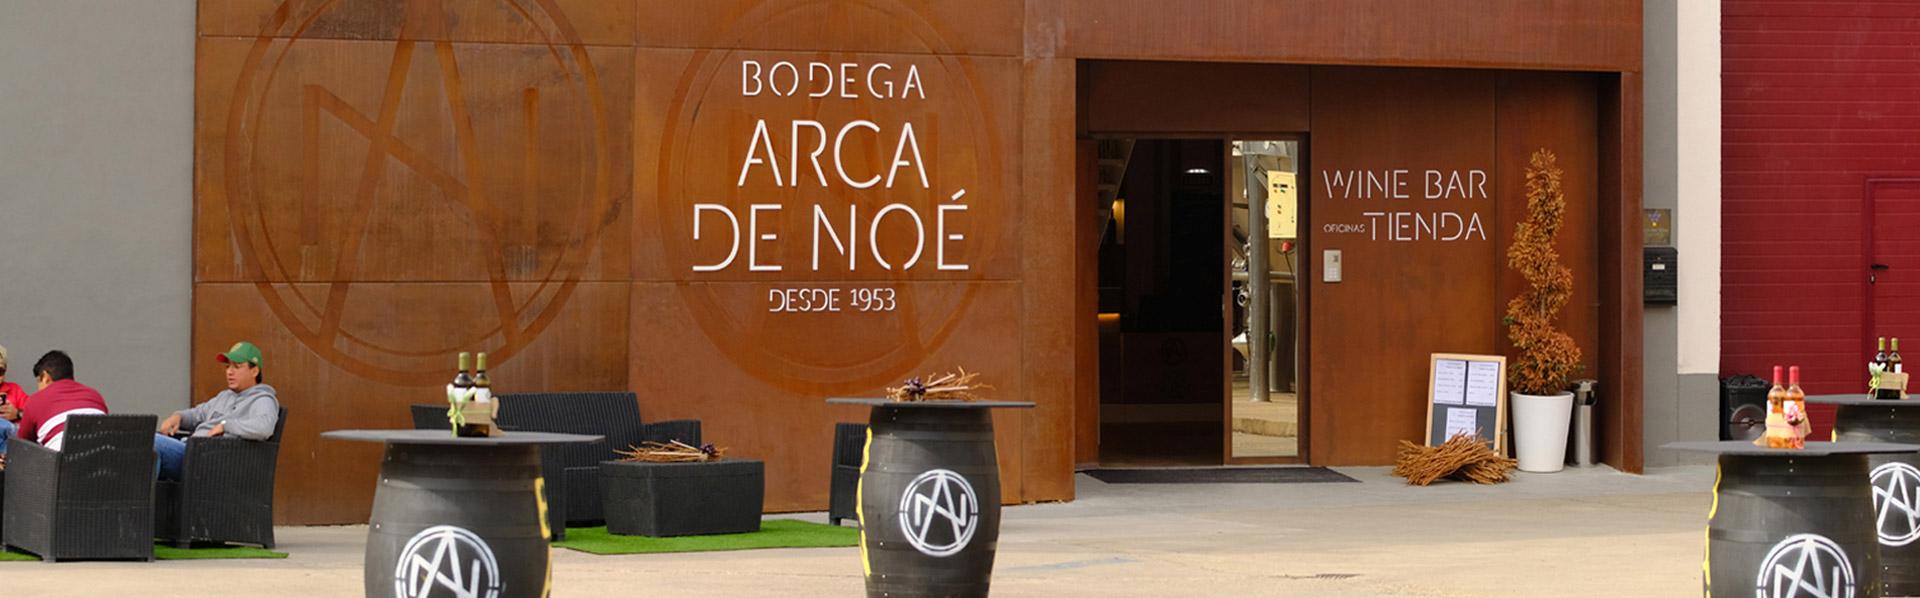 @bodega-slider_fachada_crop-bodega_el_arca_de_noe